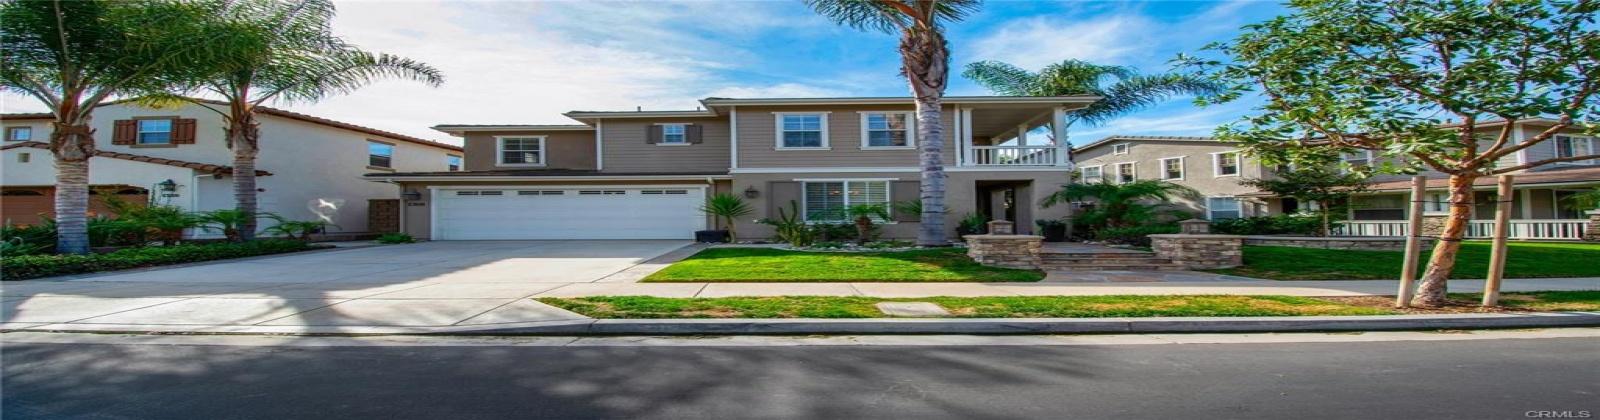 1308 Vista Prado, San Clemente, California 92673, 5 Bedrooms Bedrooms, ,4 BathroomsBathrooms,Home,Sold,Vista Prado,1014